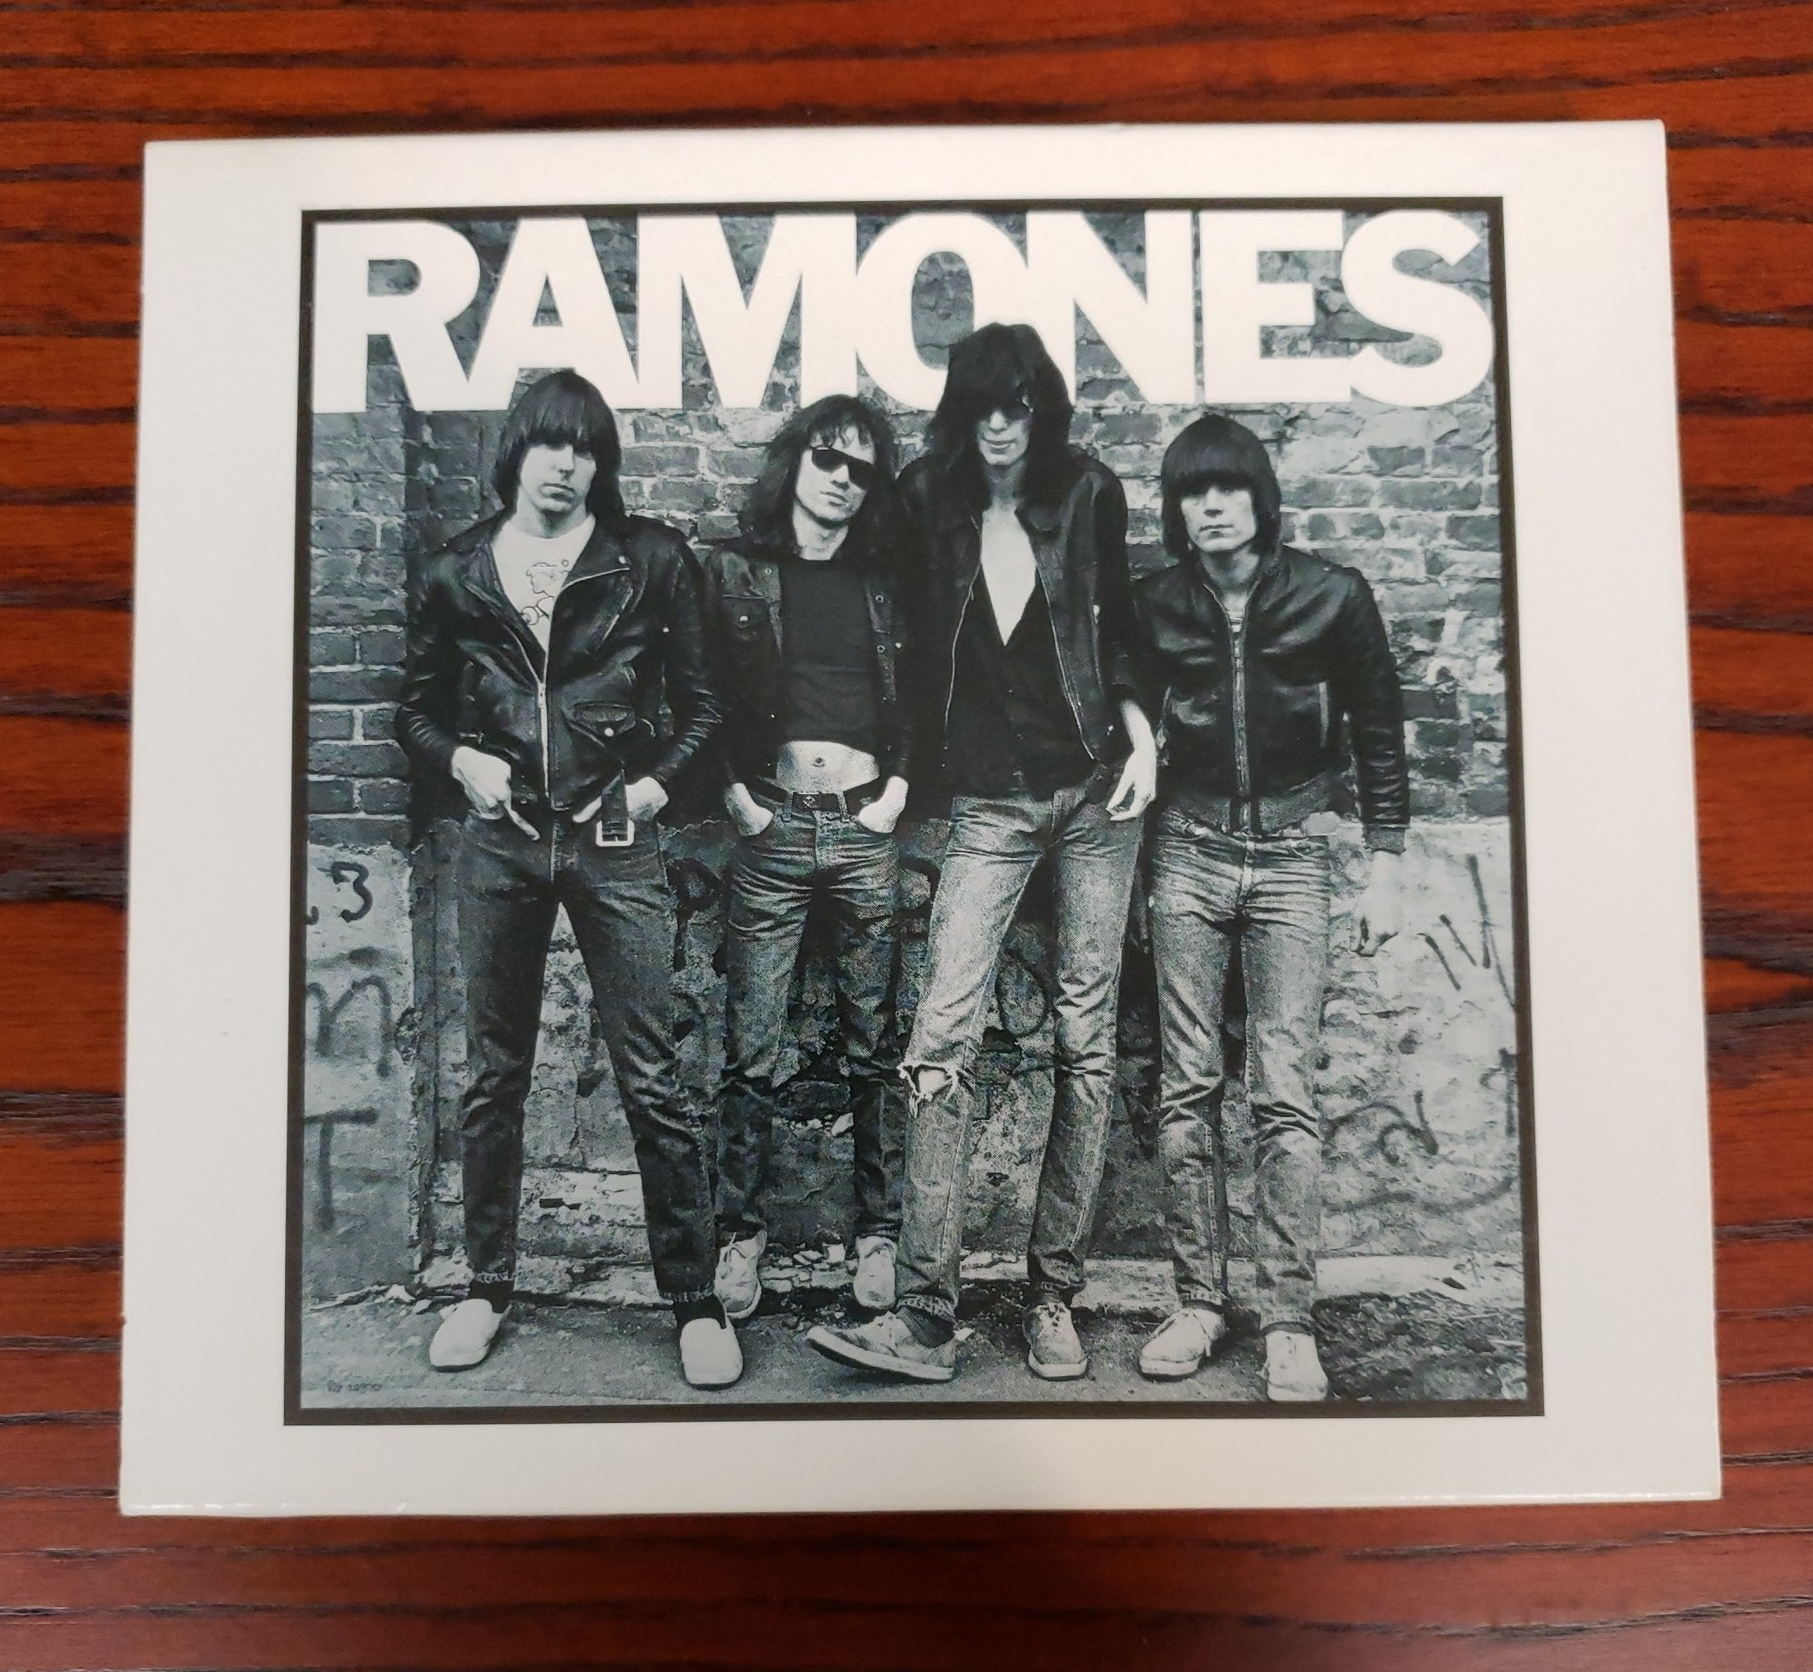 Ramones, punk rock